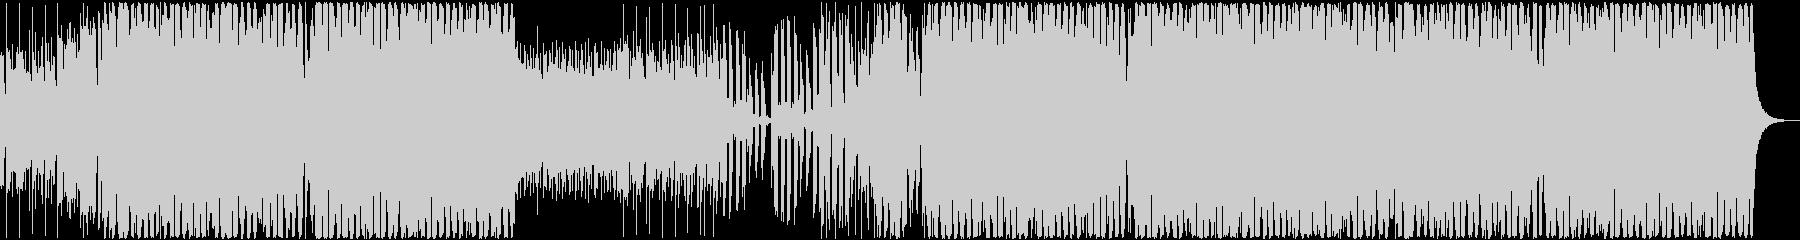 [EDM]ポップなクラブ系ハウス音楽の未再生の波形